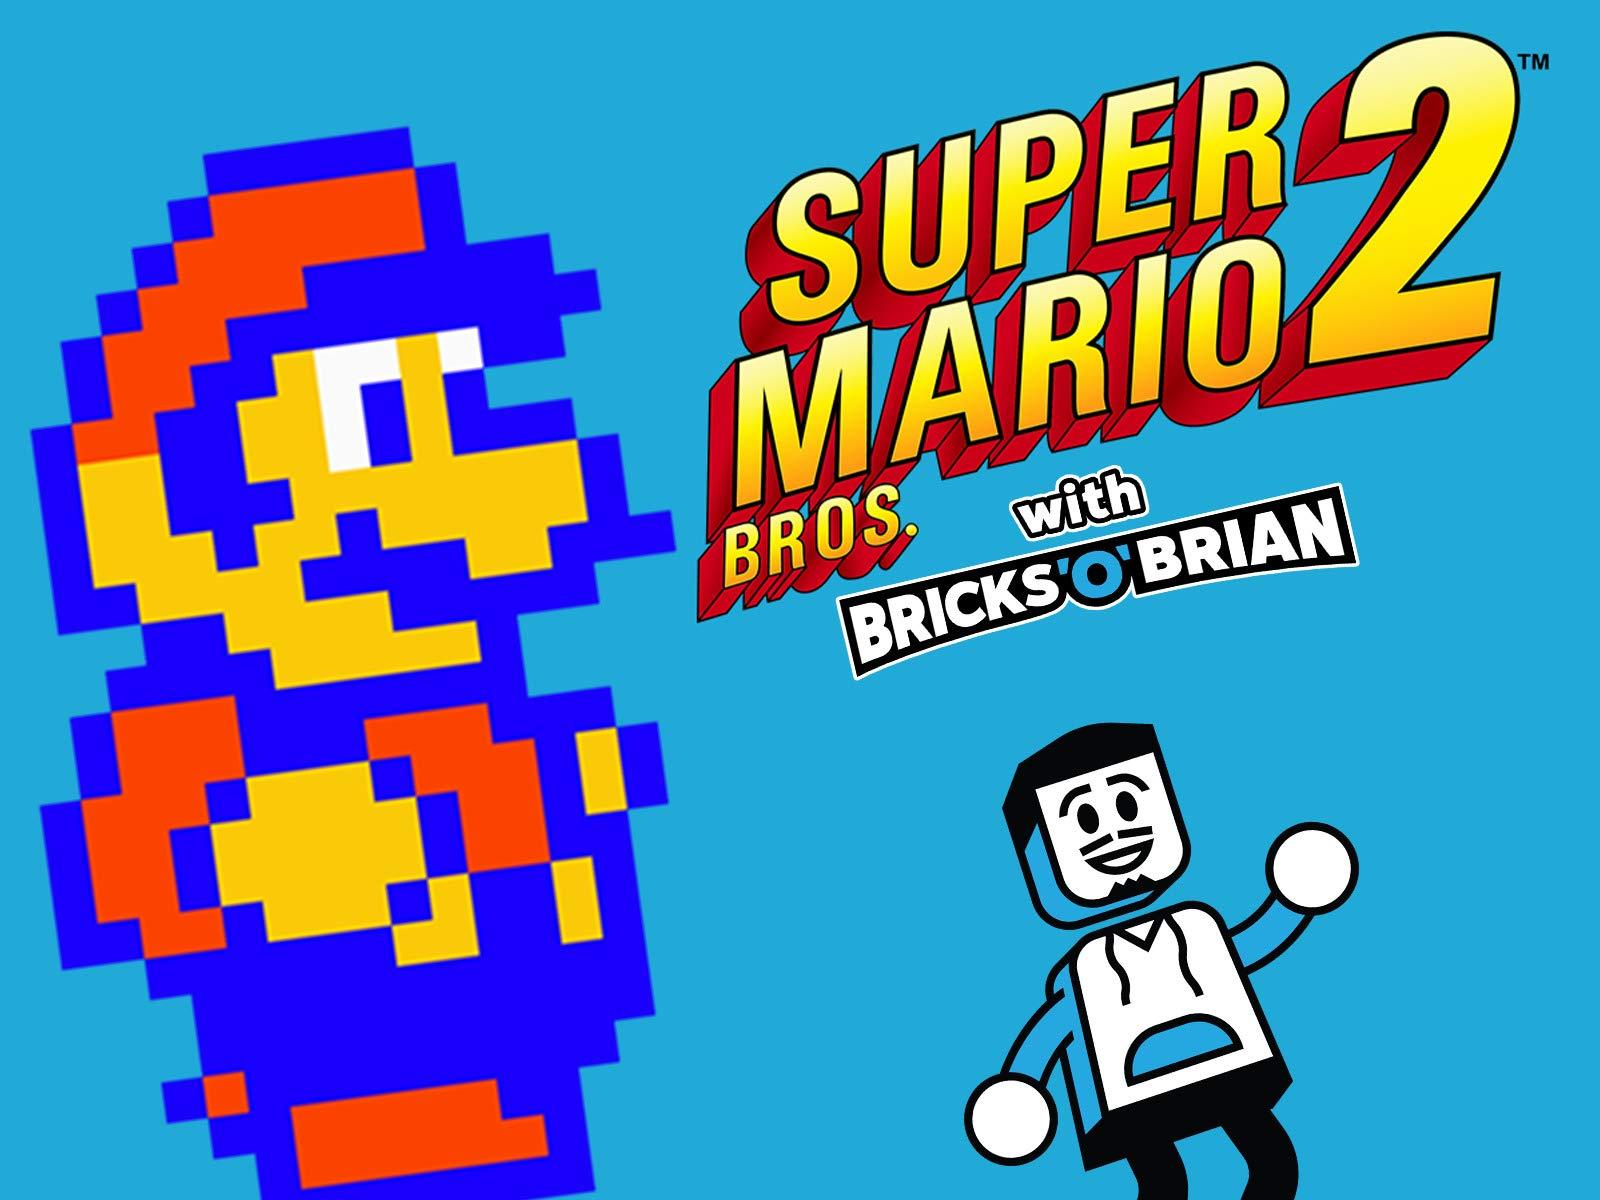 Clip: Super Mario Bros. 2 with Bricks 'O' Brian! - Season 1